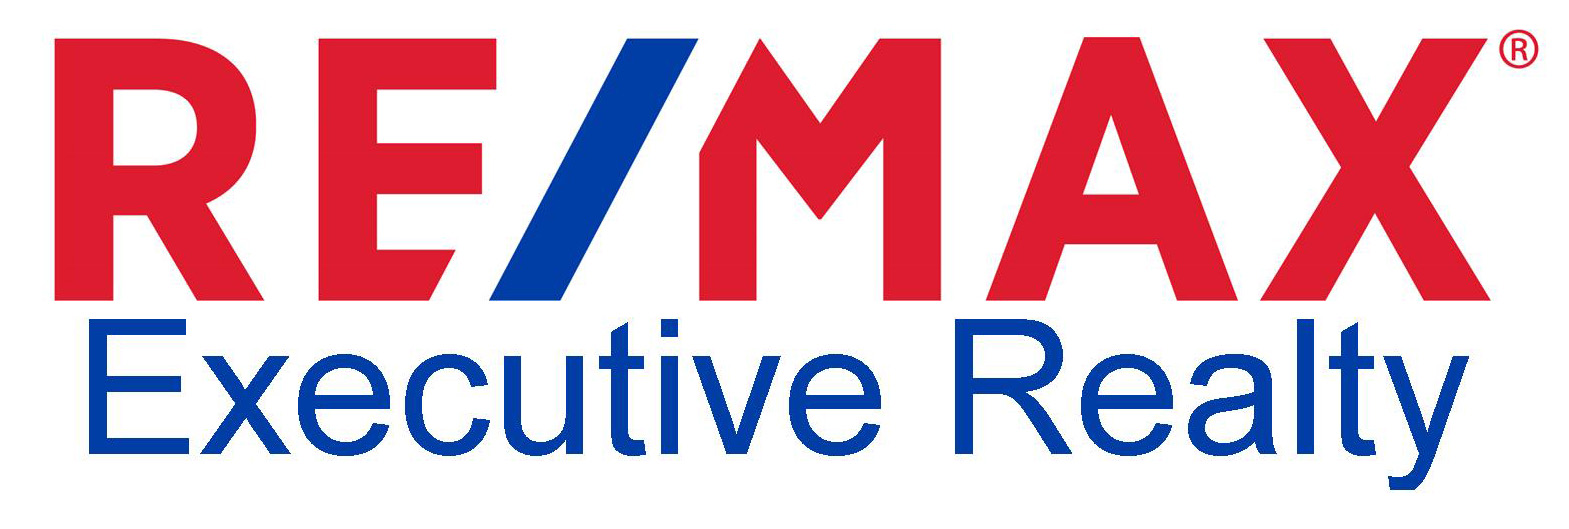 RE/MAX Executive Realty